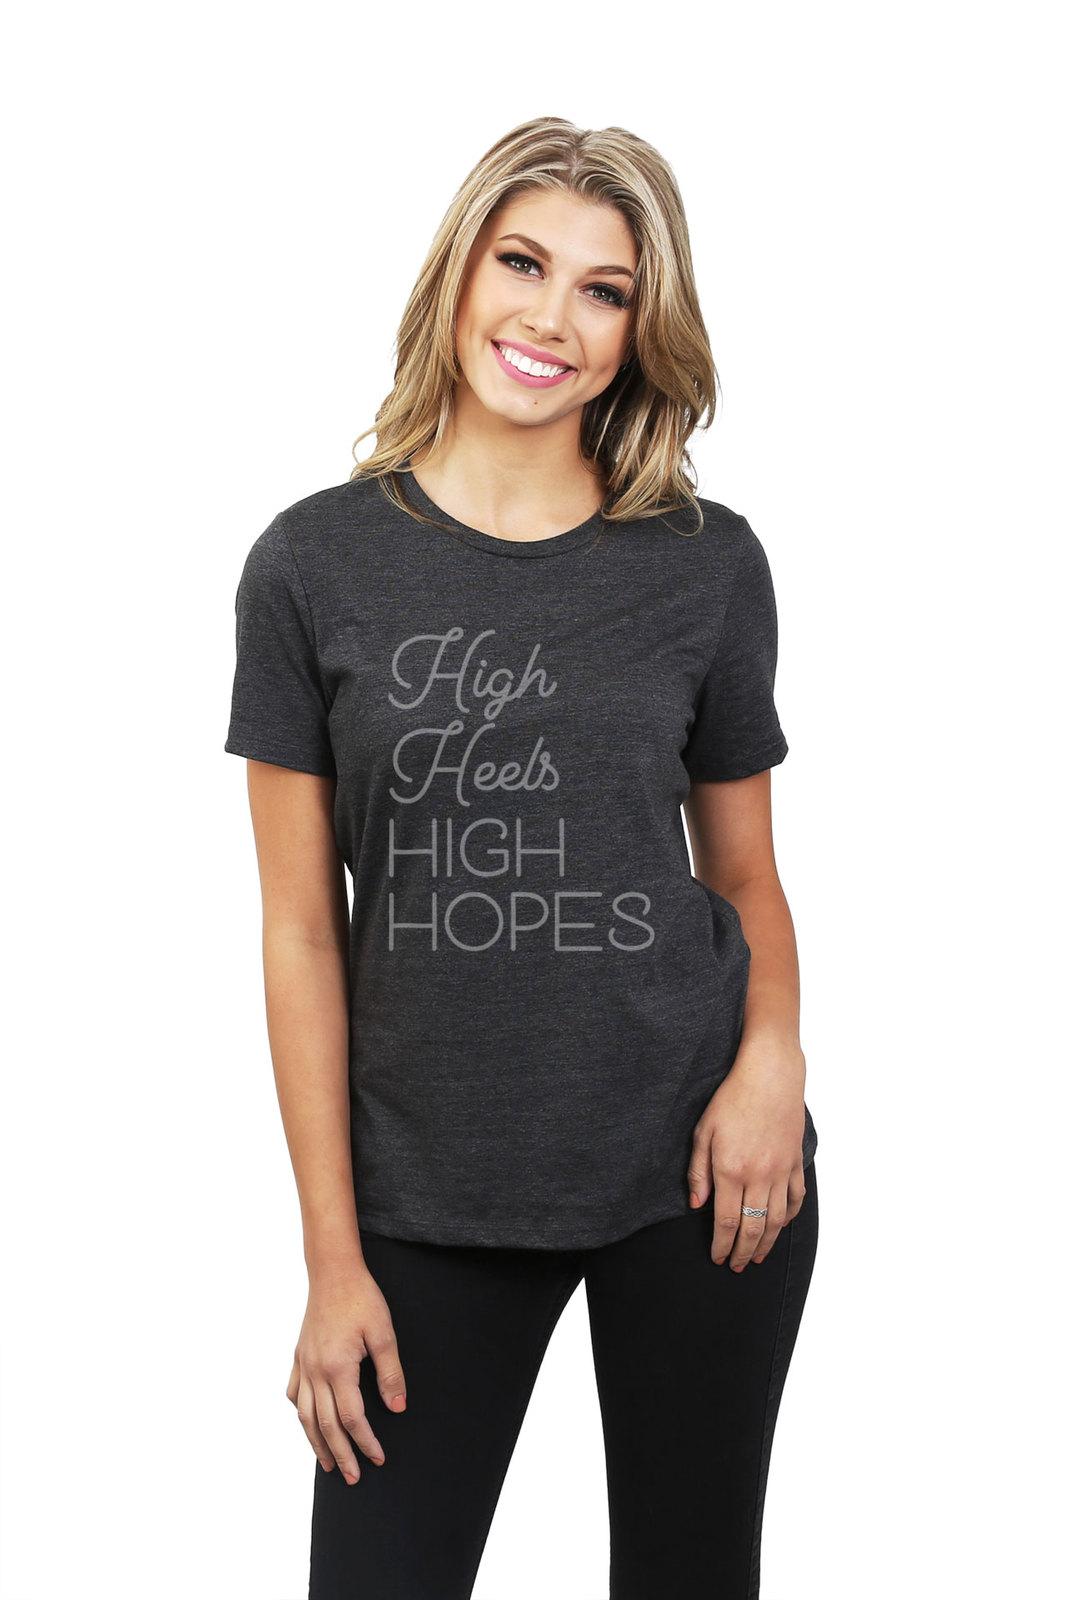 High Heels High Hopes Women's Relaxed T-Shirt Tee Charcoal Grey